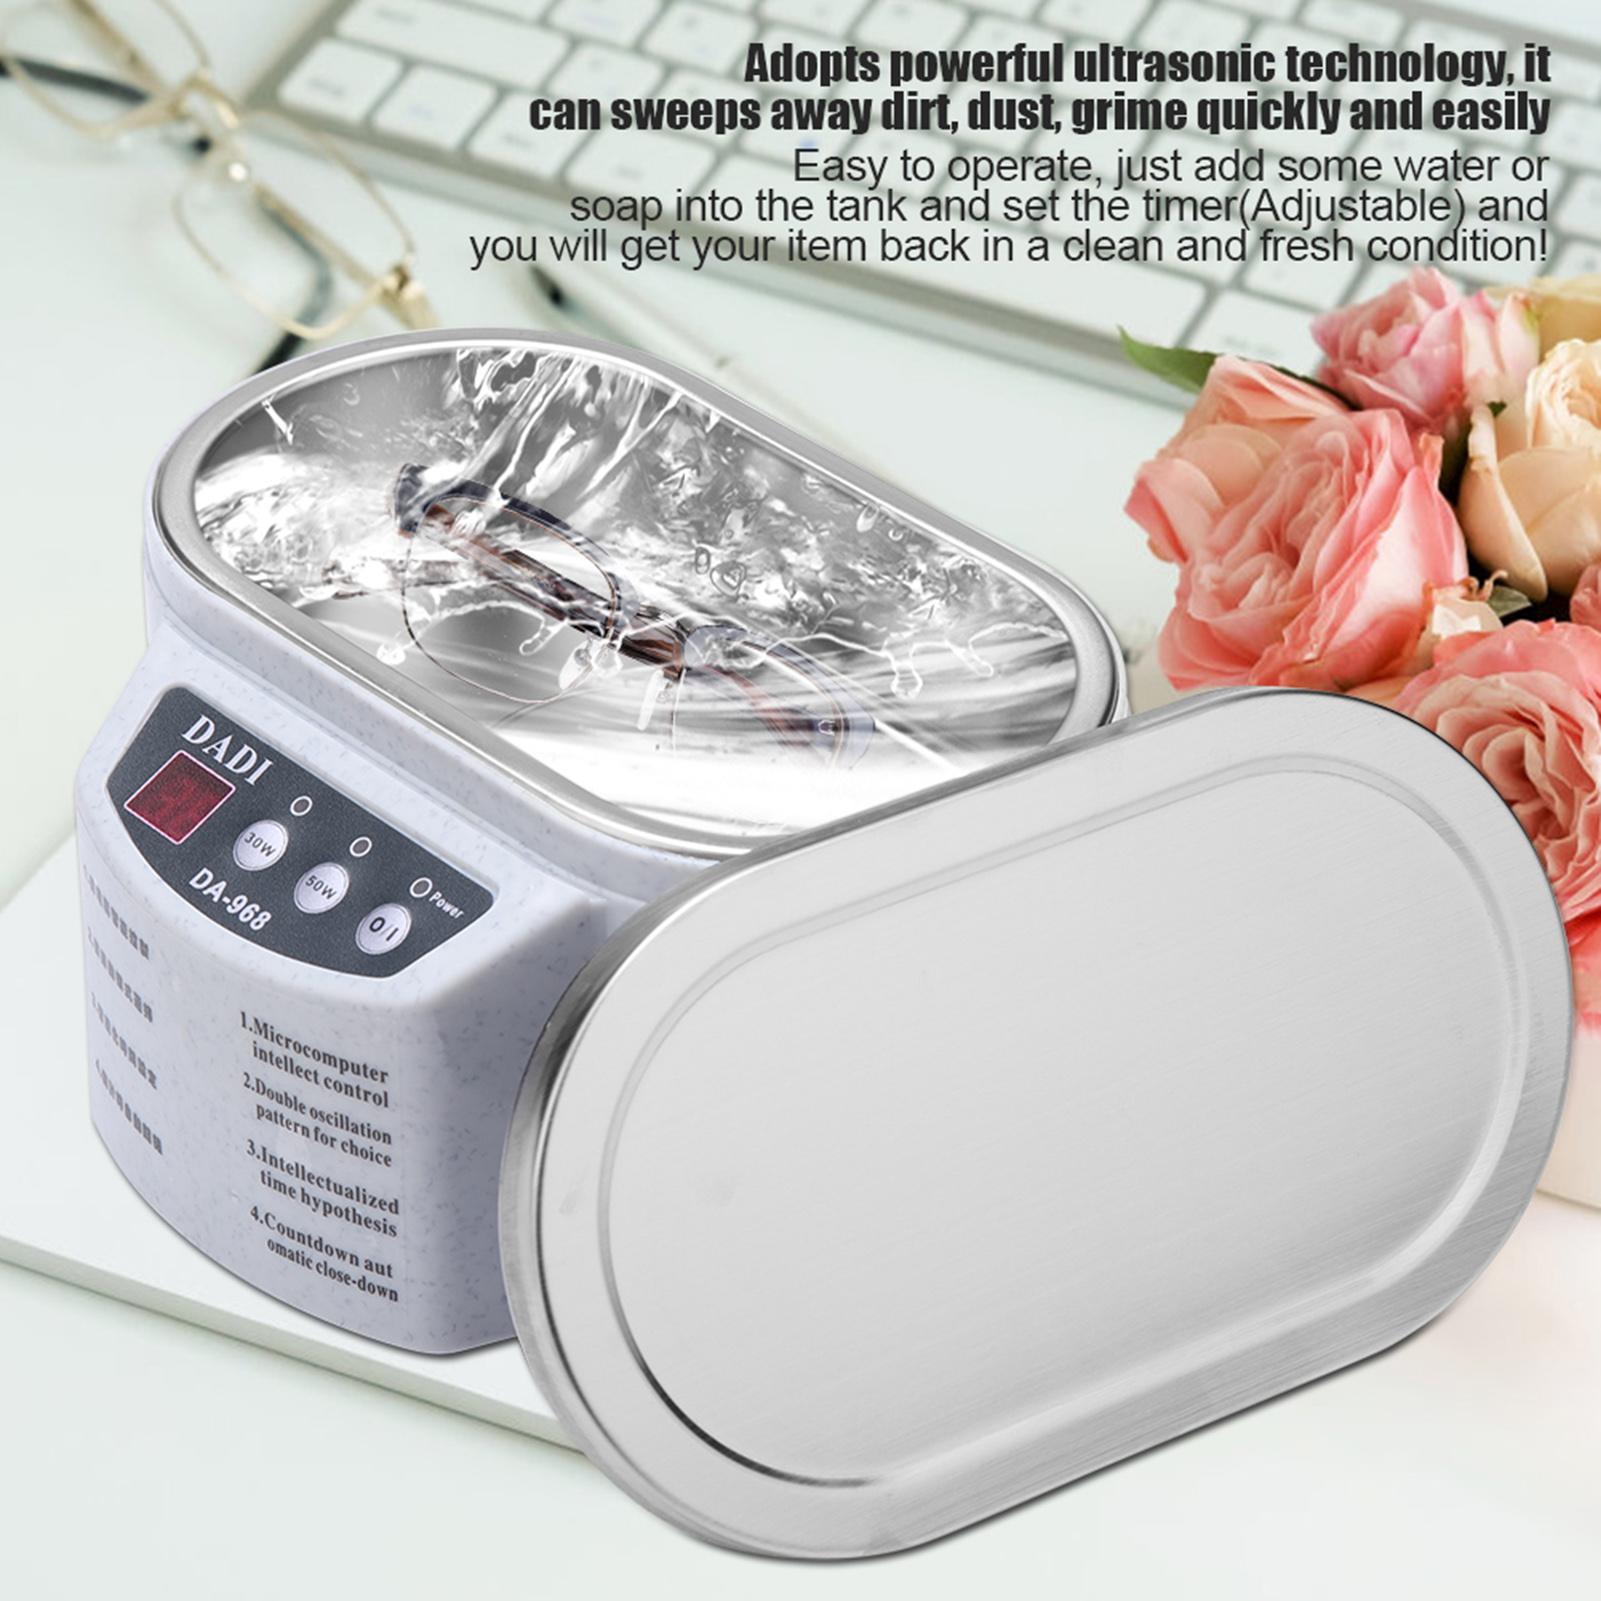 30w 50w Mini Ultrasonic Cleaner Bath For Cleaning Jewelry Glasses Circuit Board